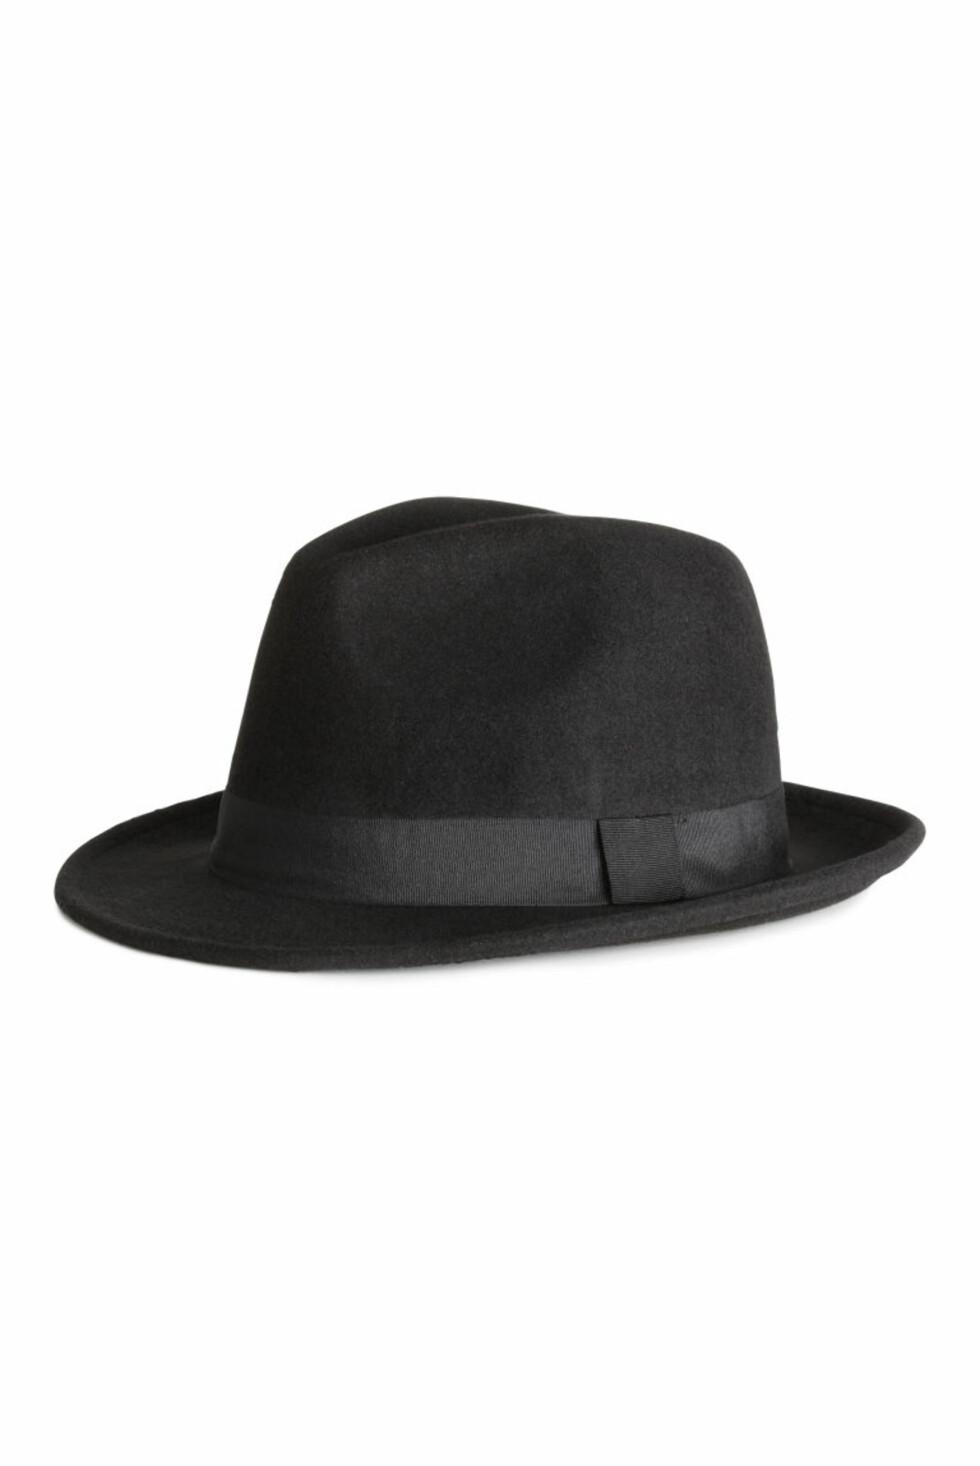 Hatt fra H&M |149,-| http://www2.hm.com/no_no/productpage.0375917001.html